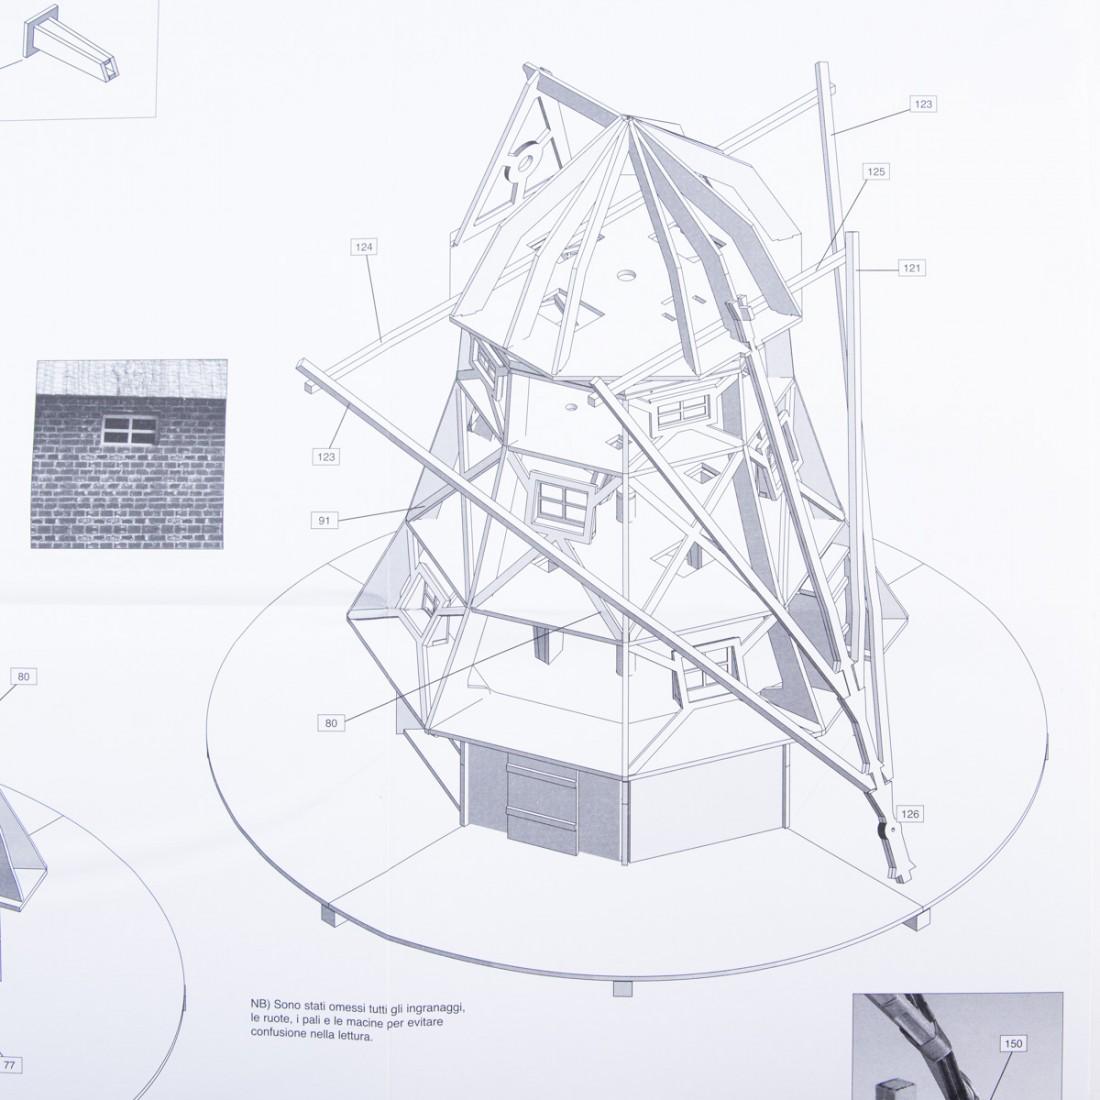 Plan de molino de viento holandés